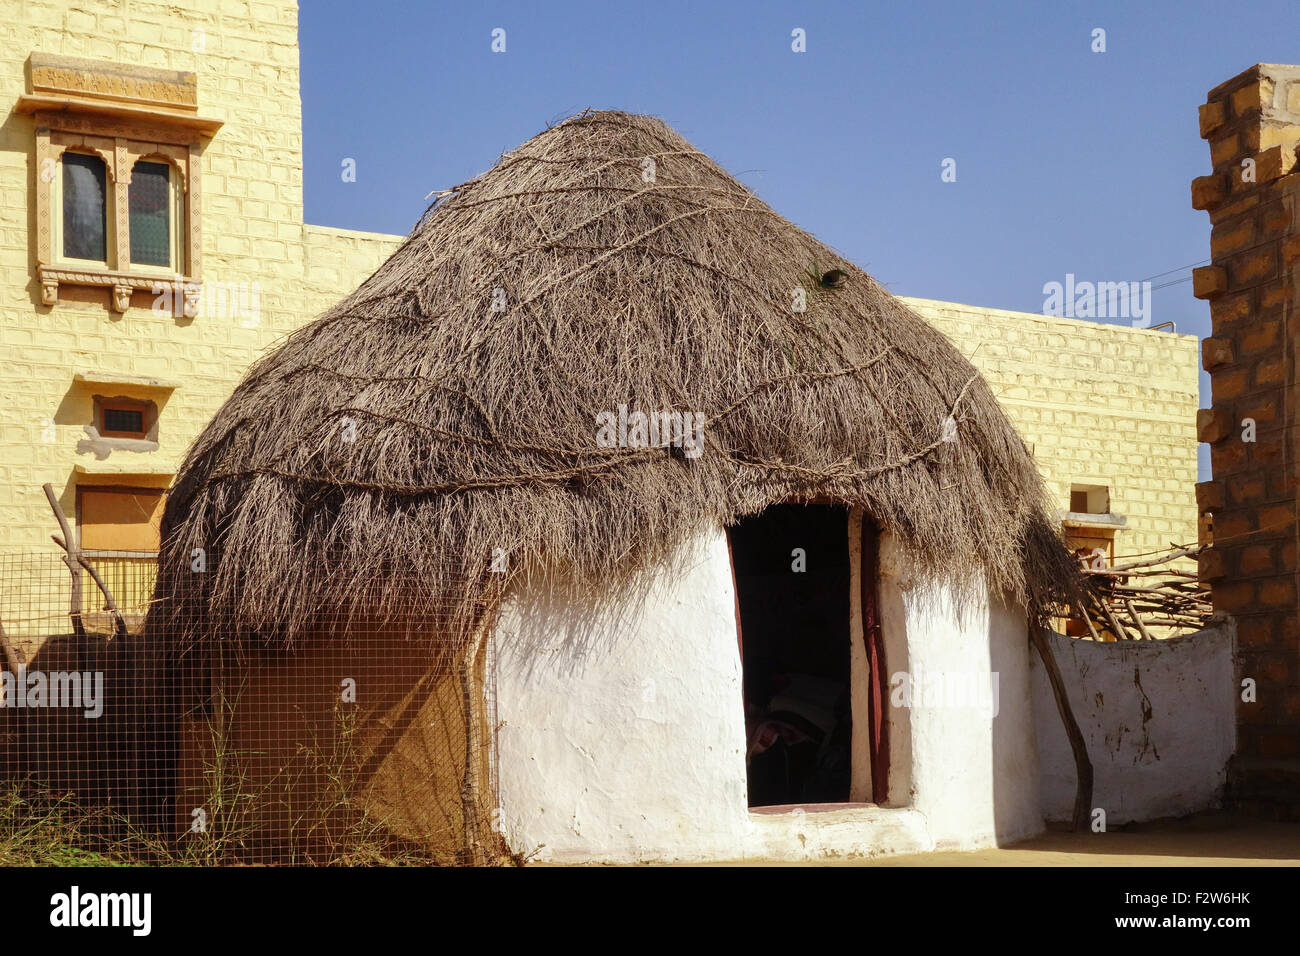 Mud hut with roof made of straws at badal house in khuri village jaisalmer